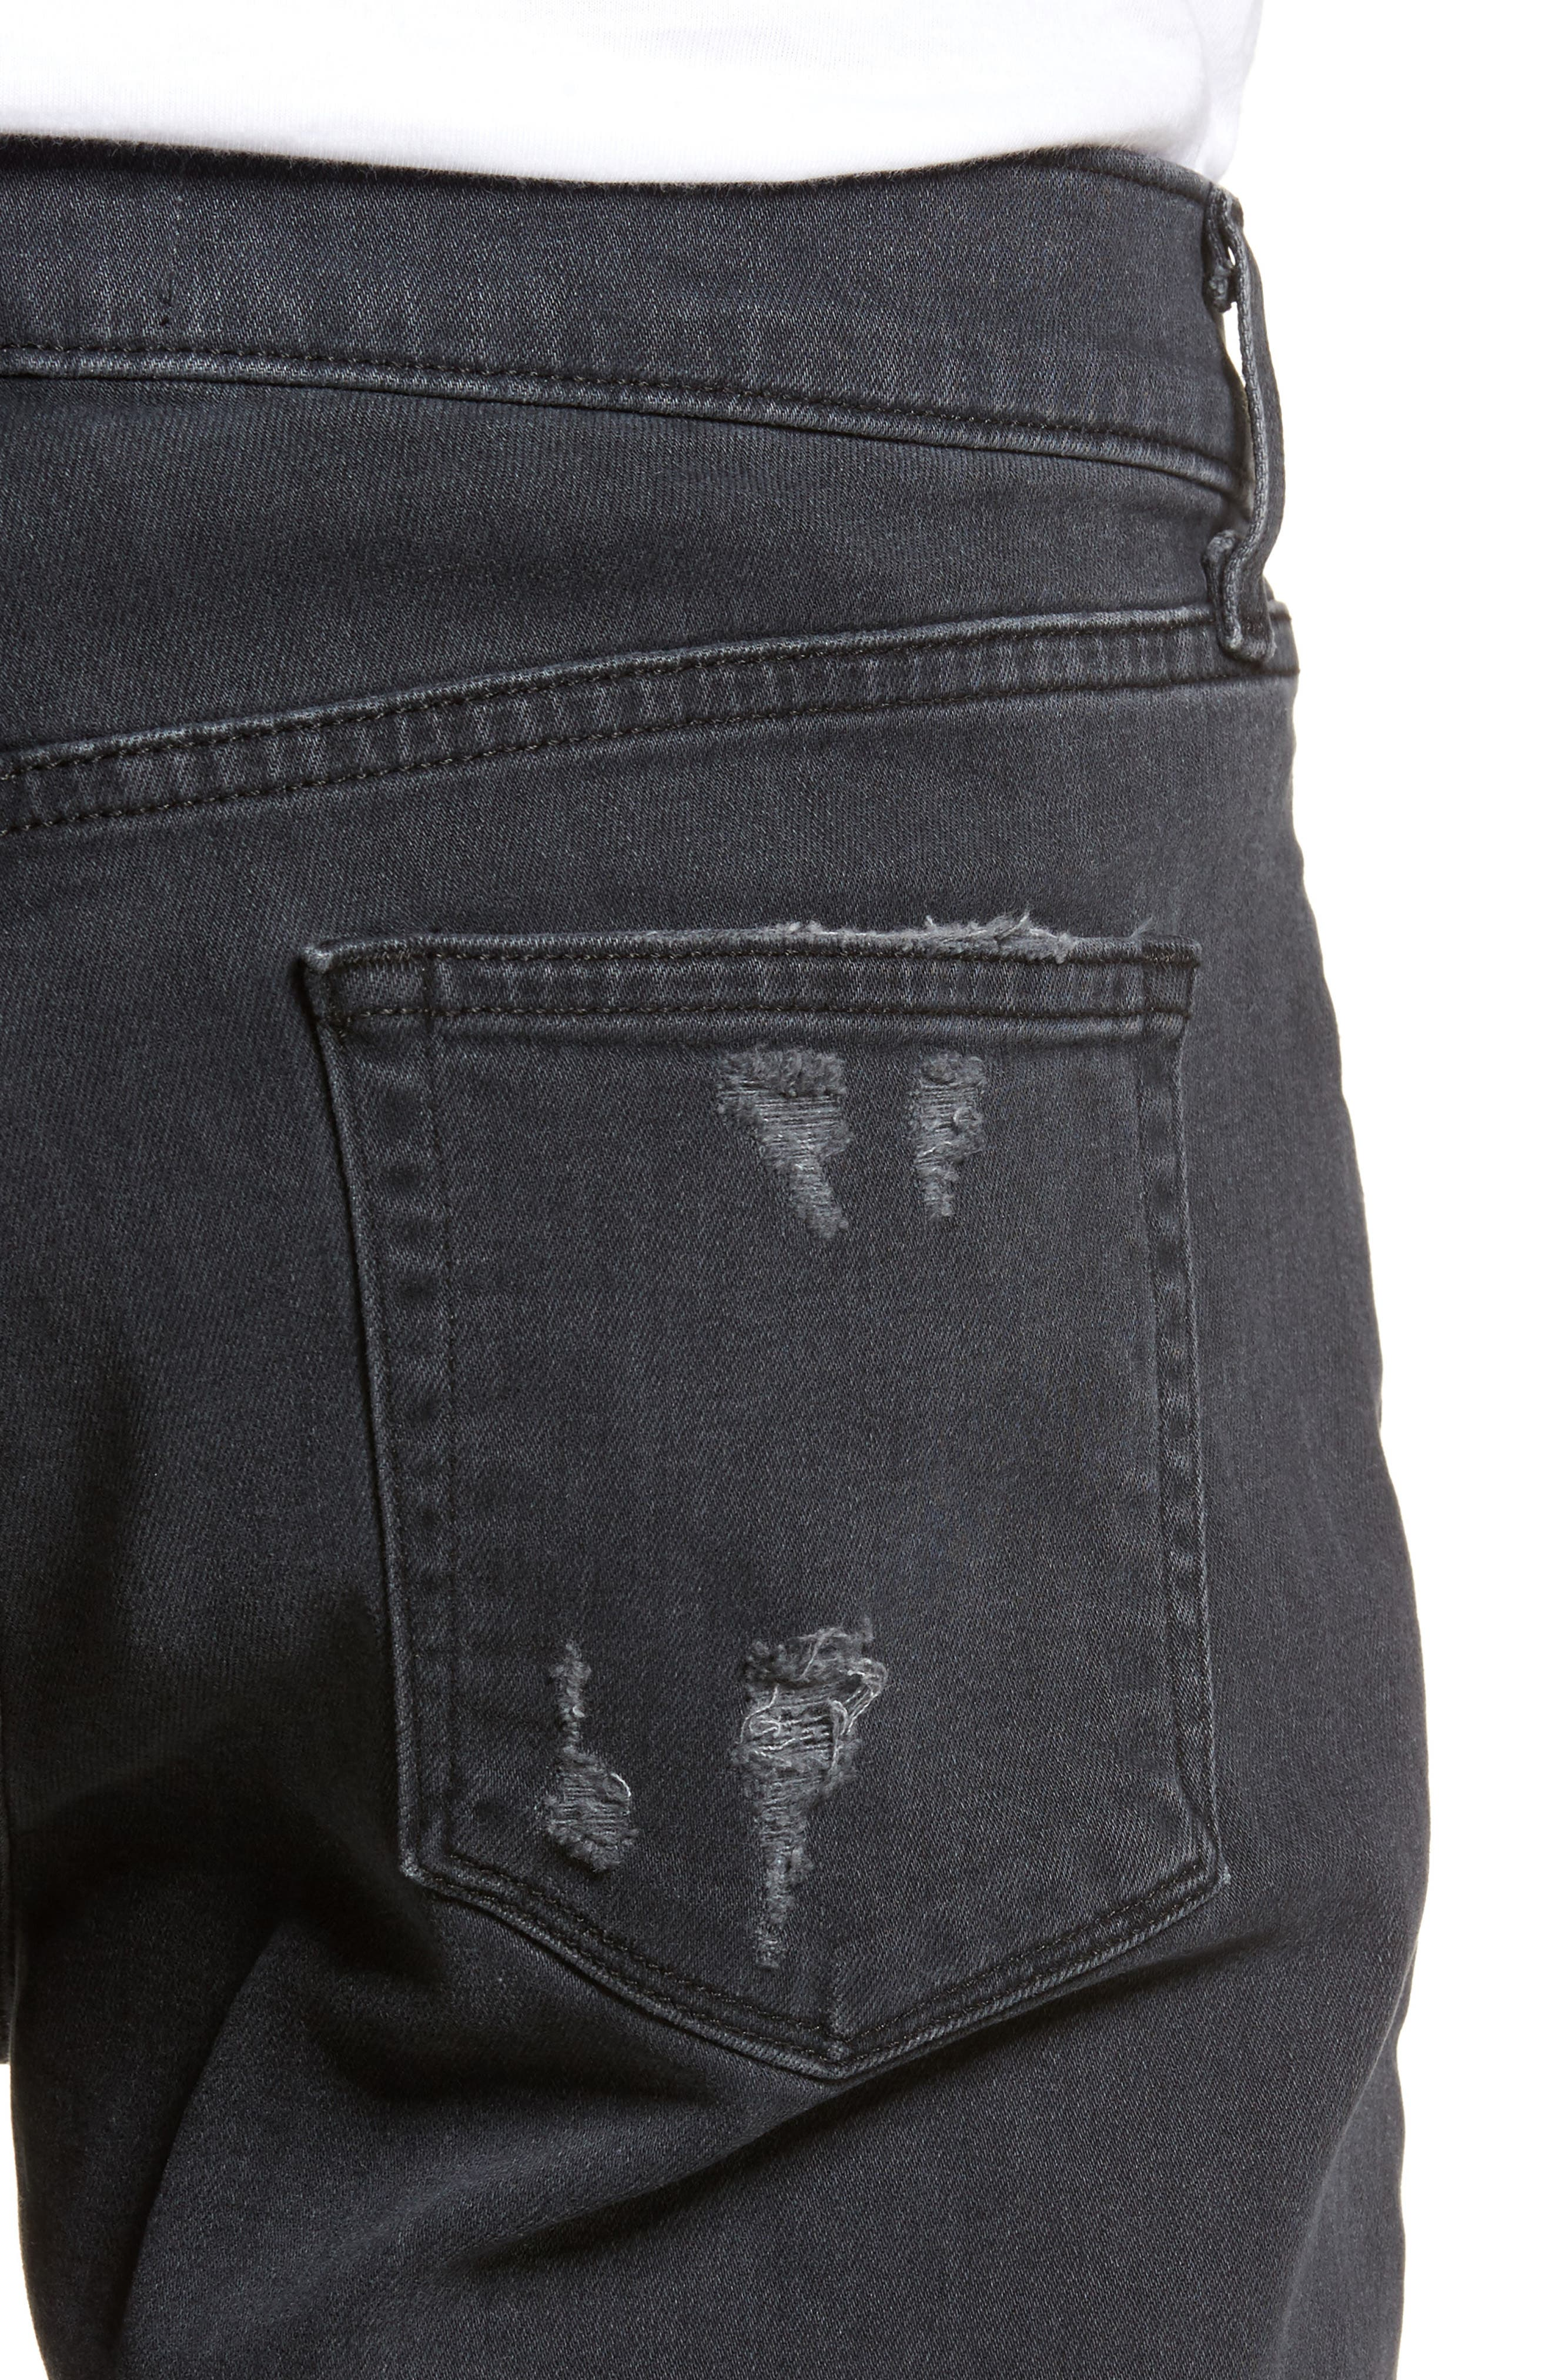 Tyler Slim Fit Jeans,                             Alternate thumbnail 4, color,                             001